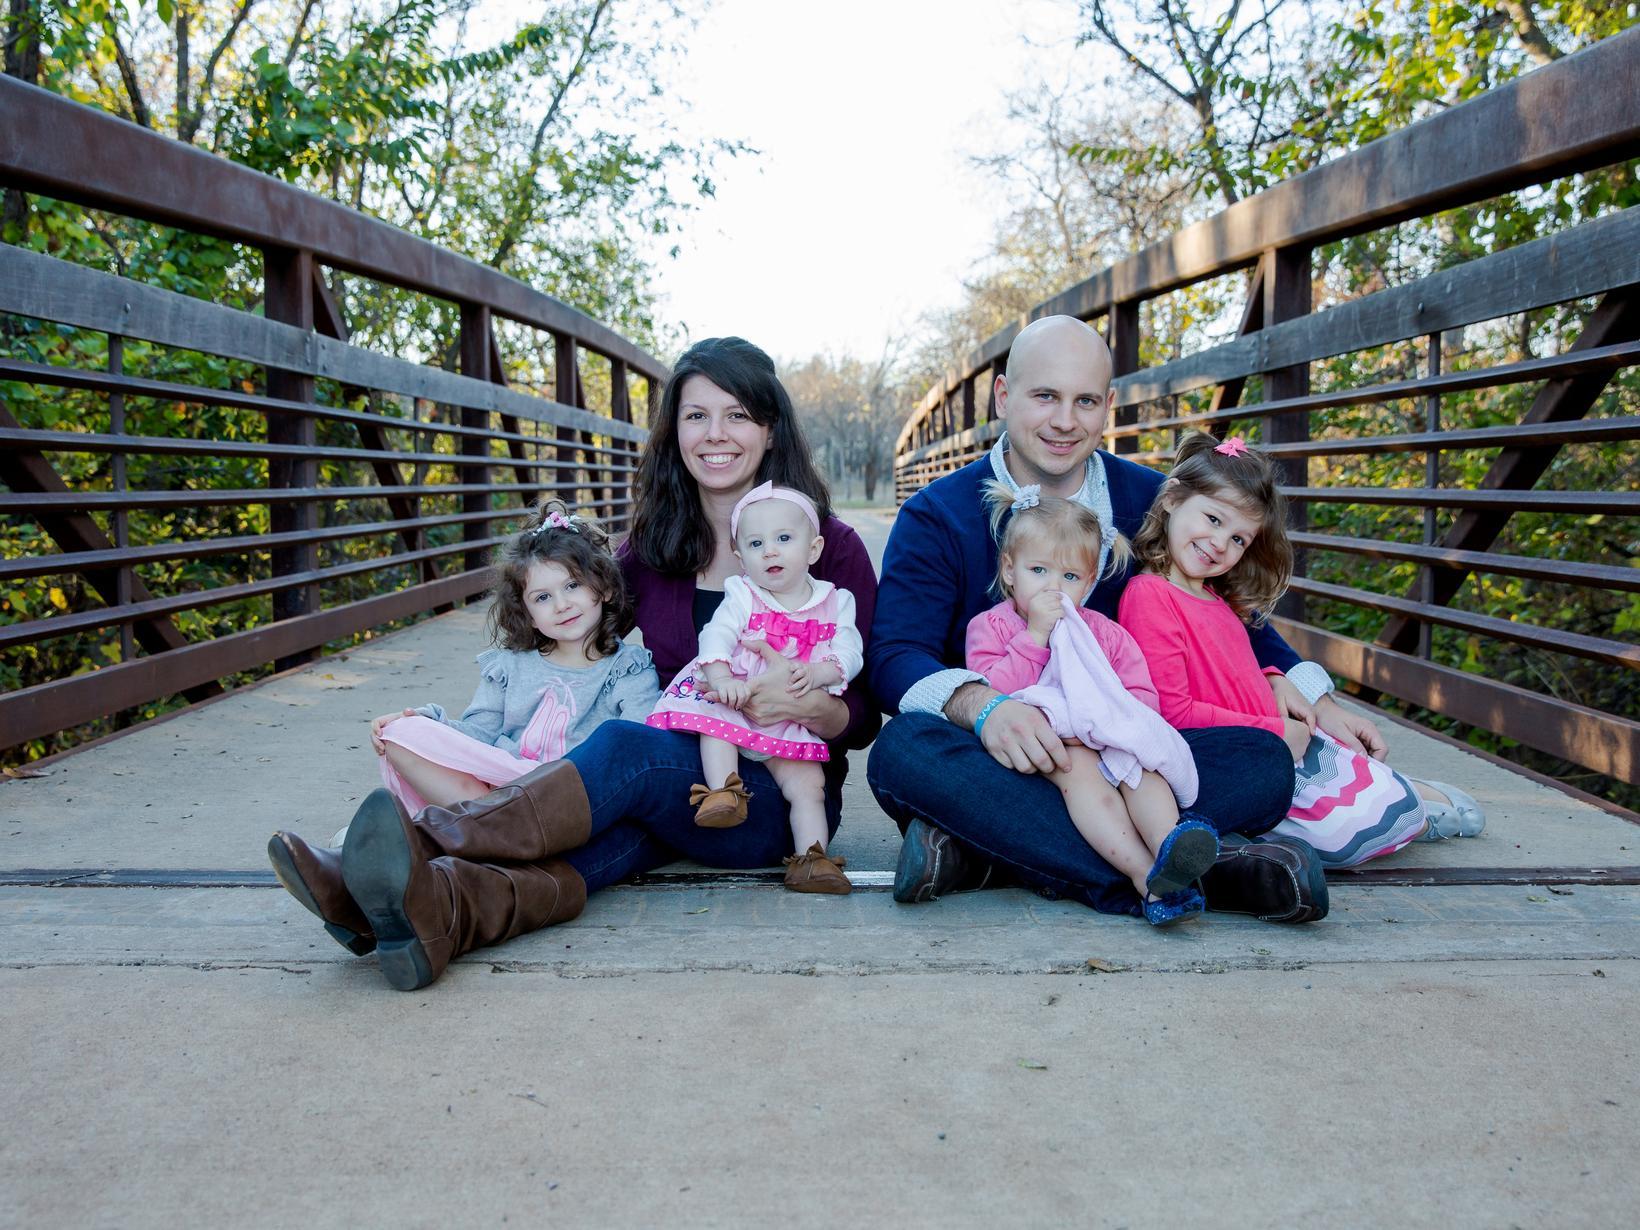 Kristan & Christopher from Yukon, Oklahoma, United States